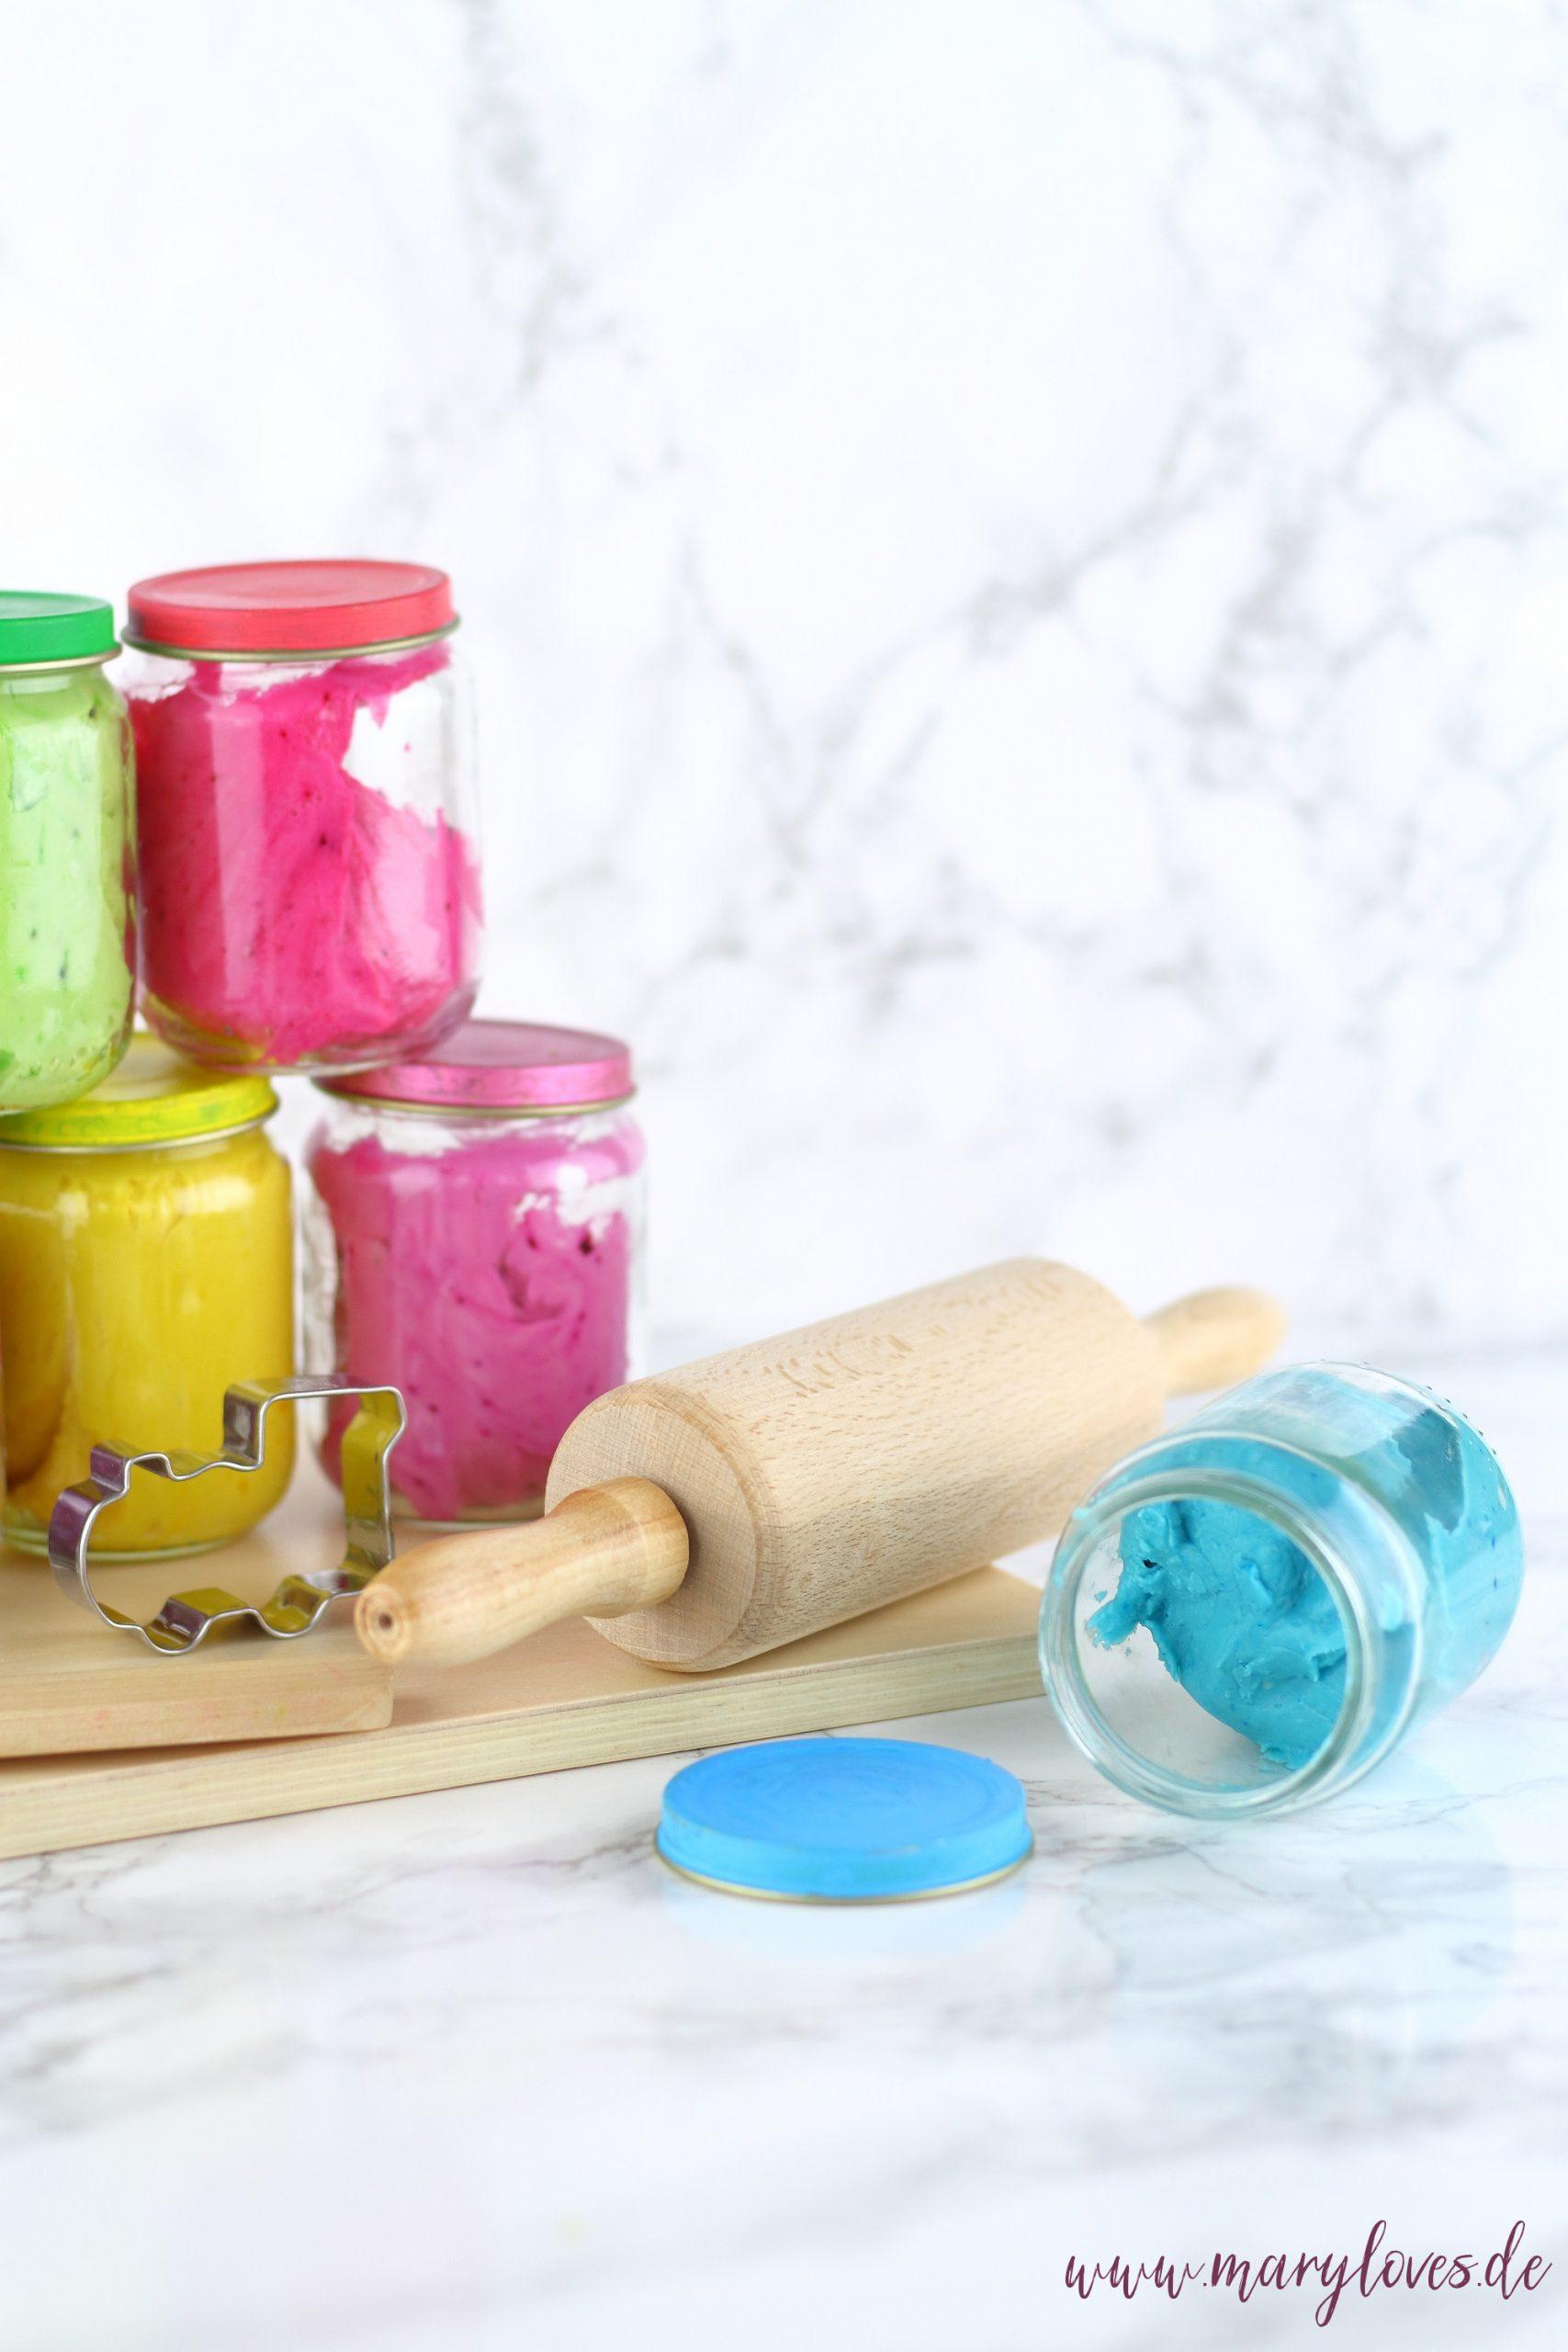 DIY Kinderknete - Ungiftige Knete selber machen